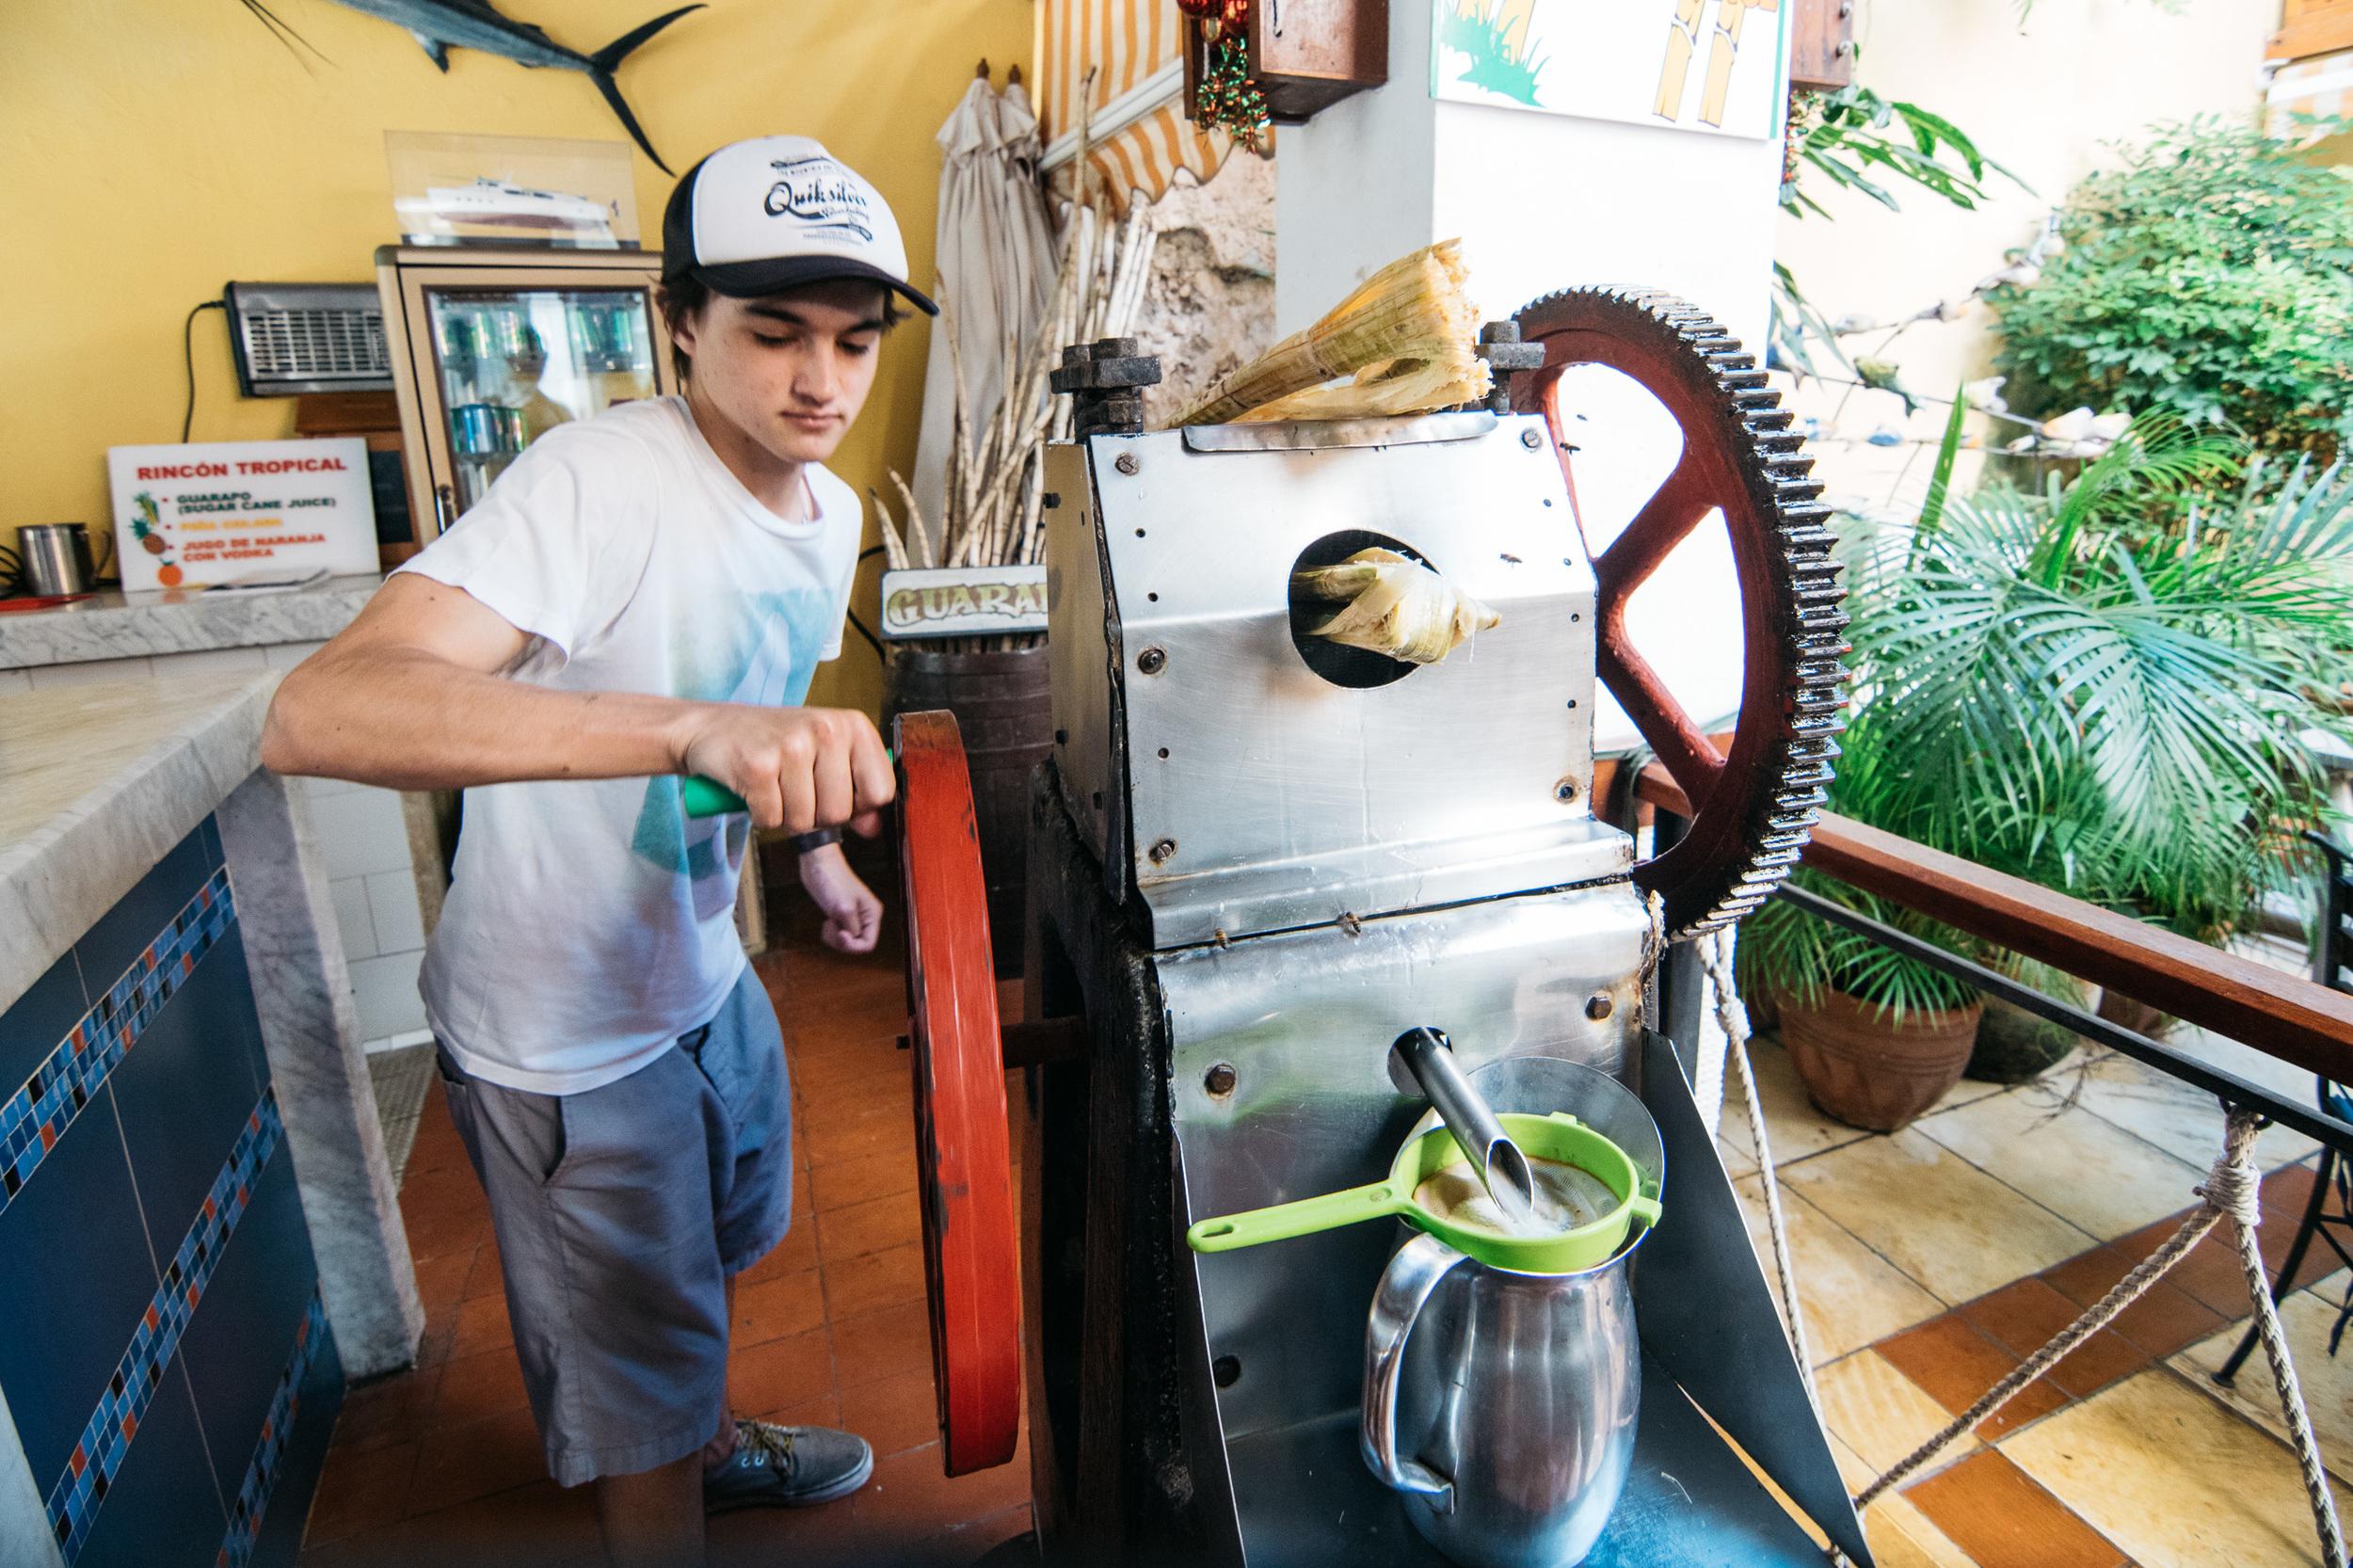 DeClaro-Photography-Cuba-02374.jpg